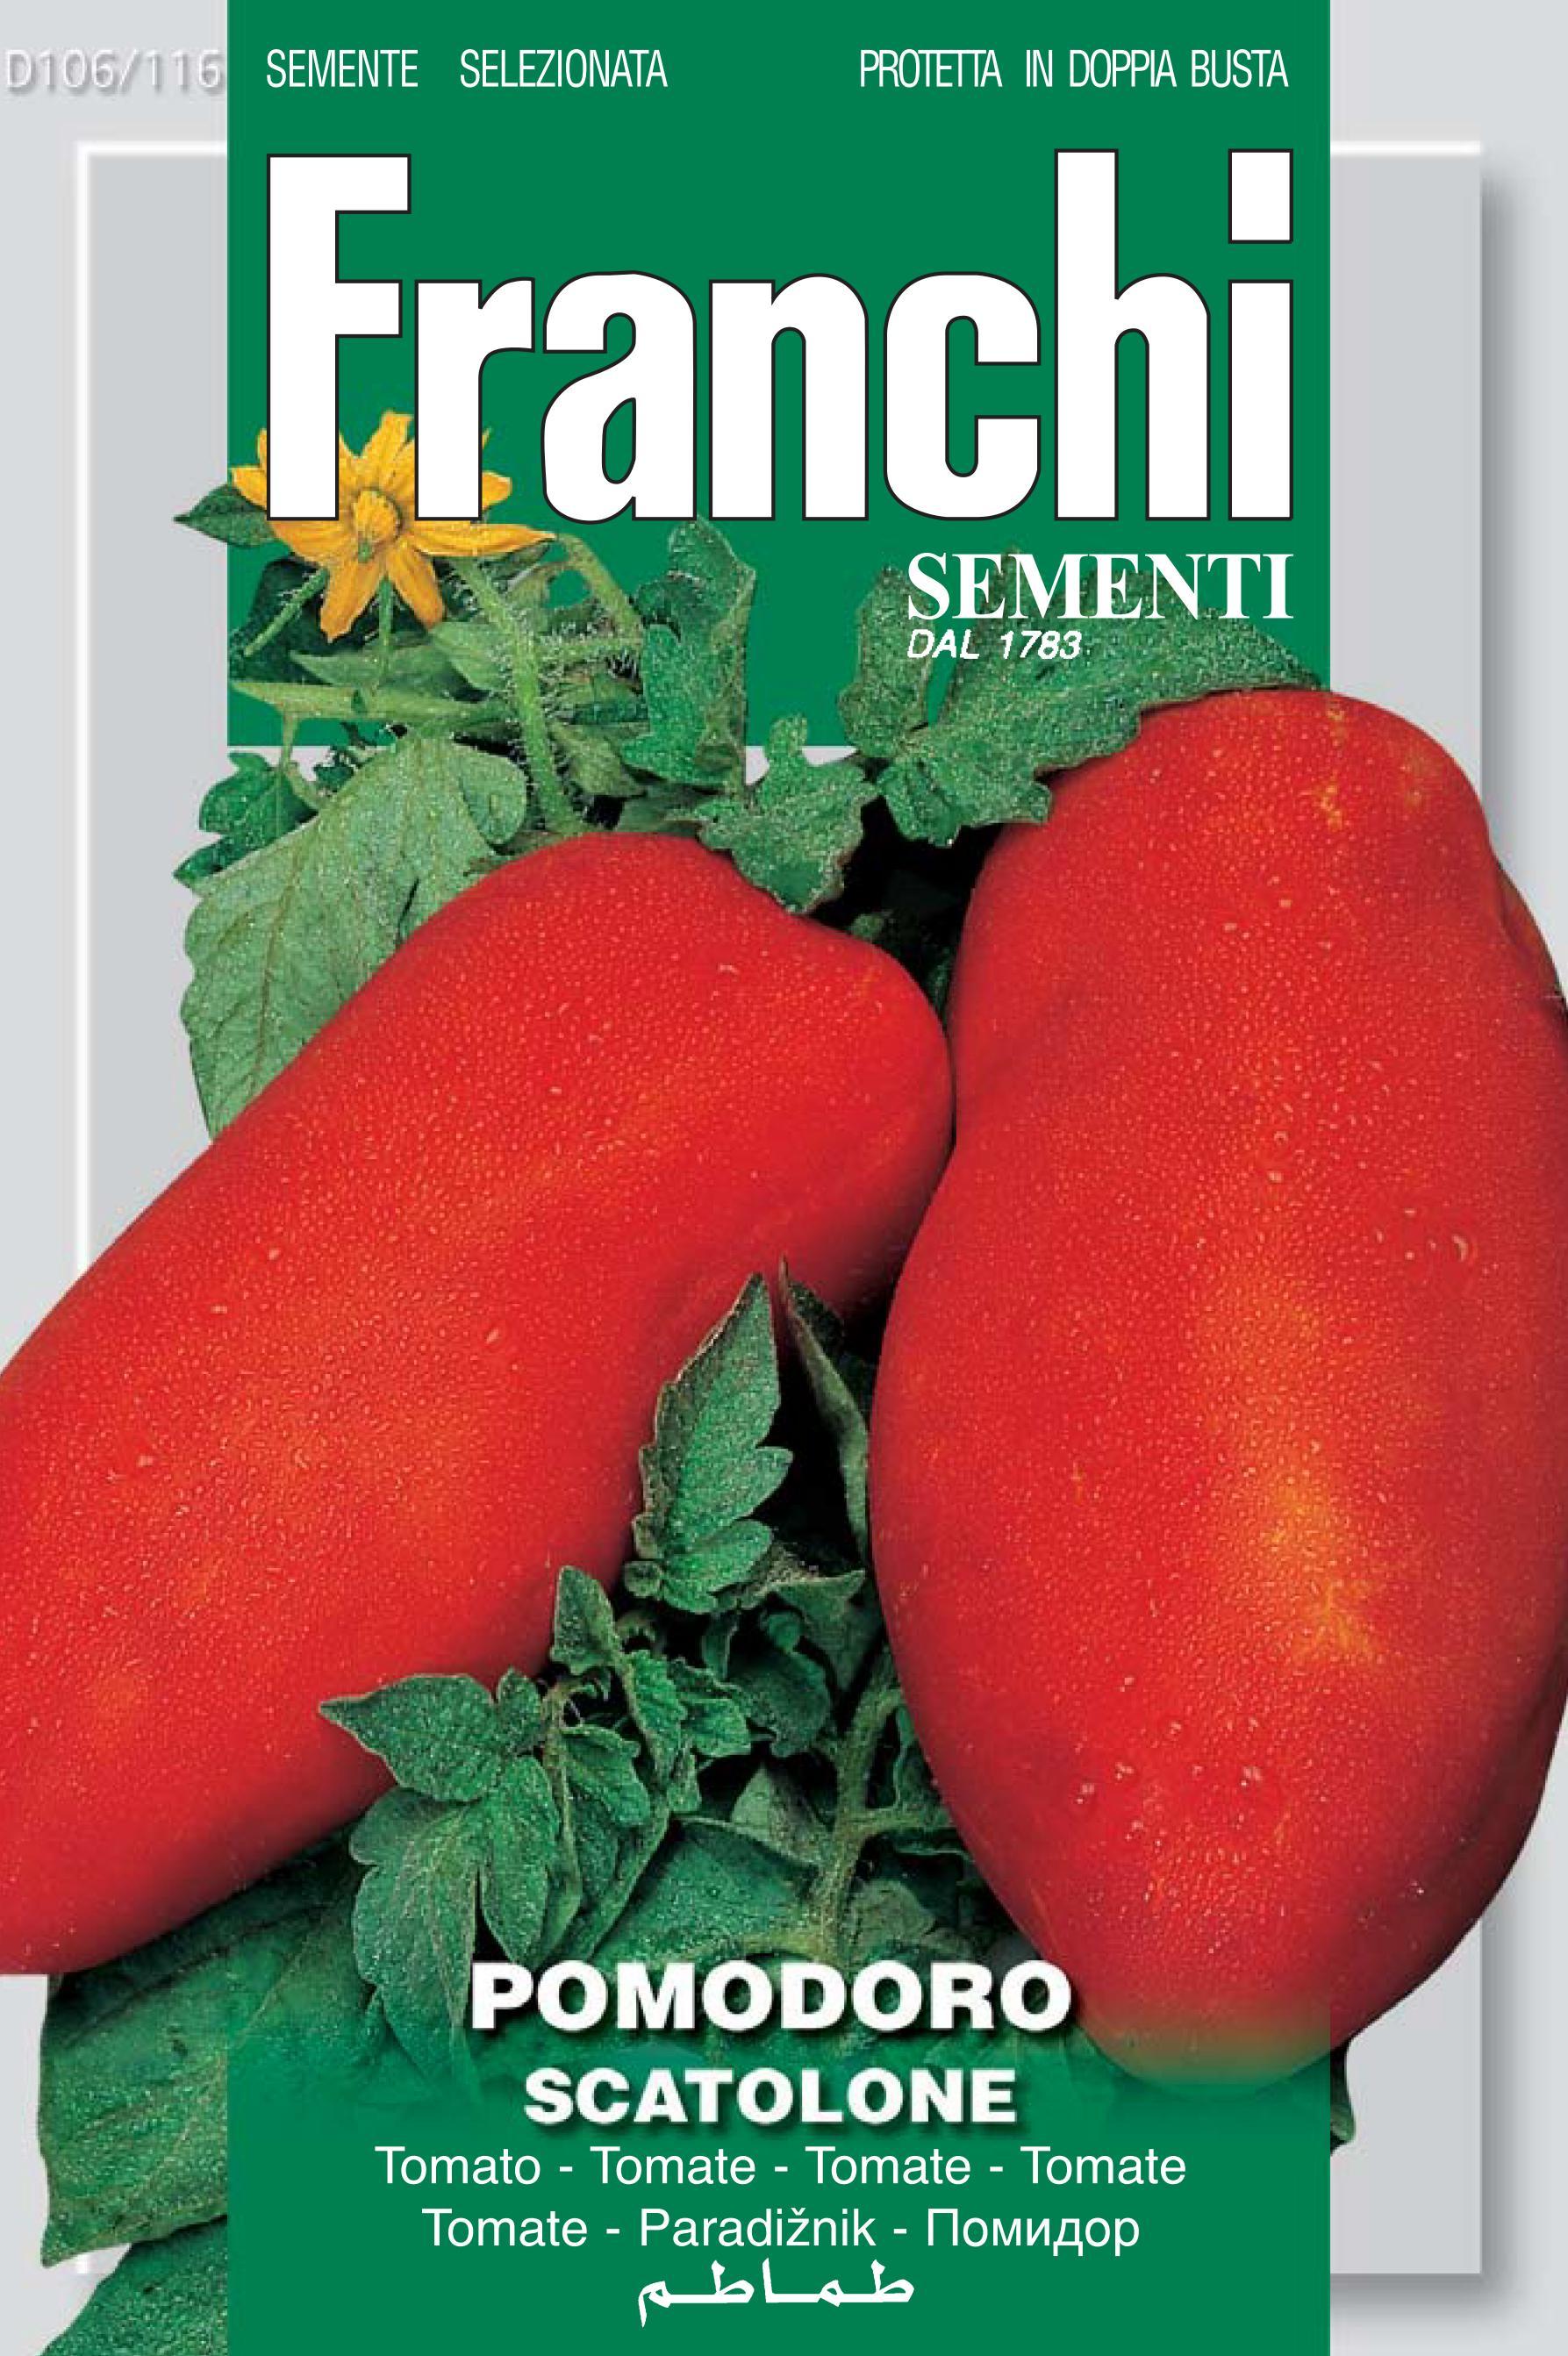 Tomato Scatolone Of Bolsena (A) Solanum Lycopersicum L.